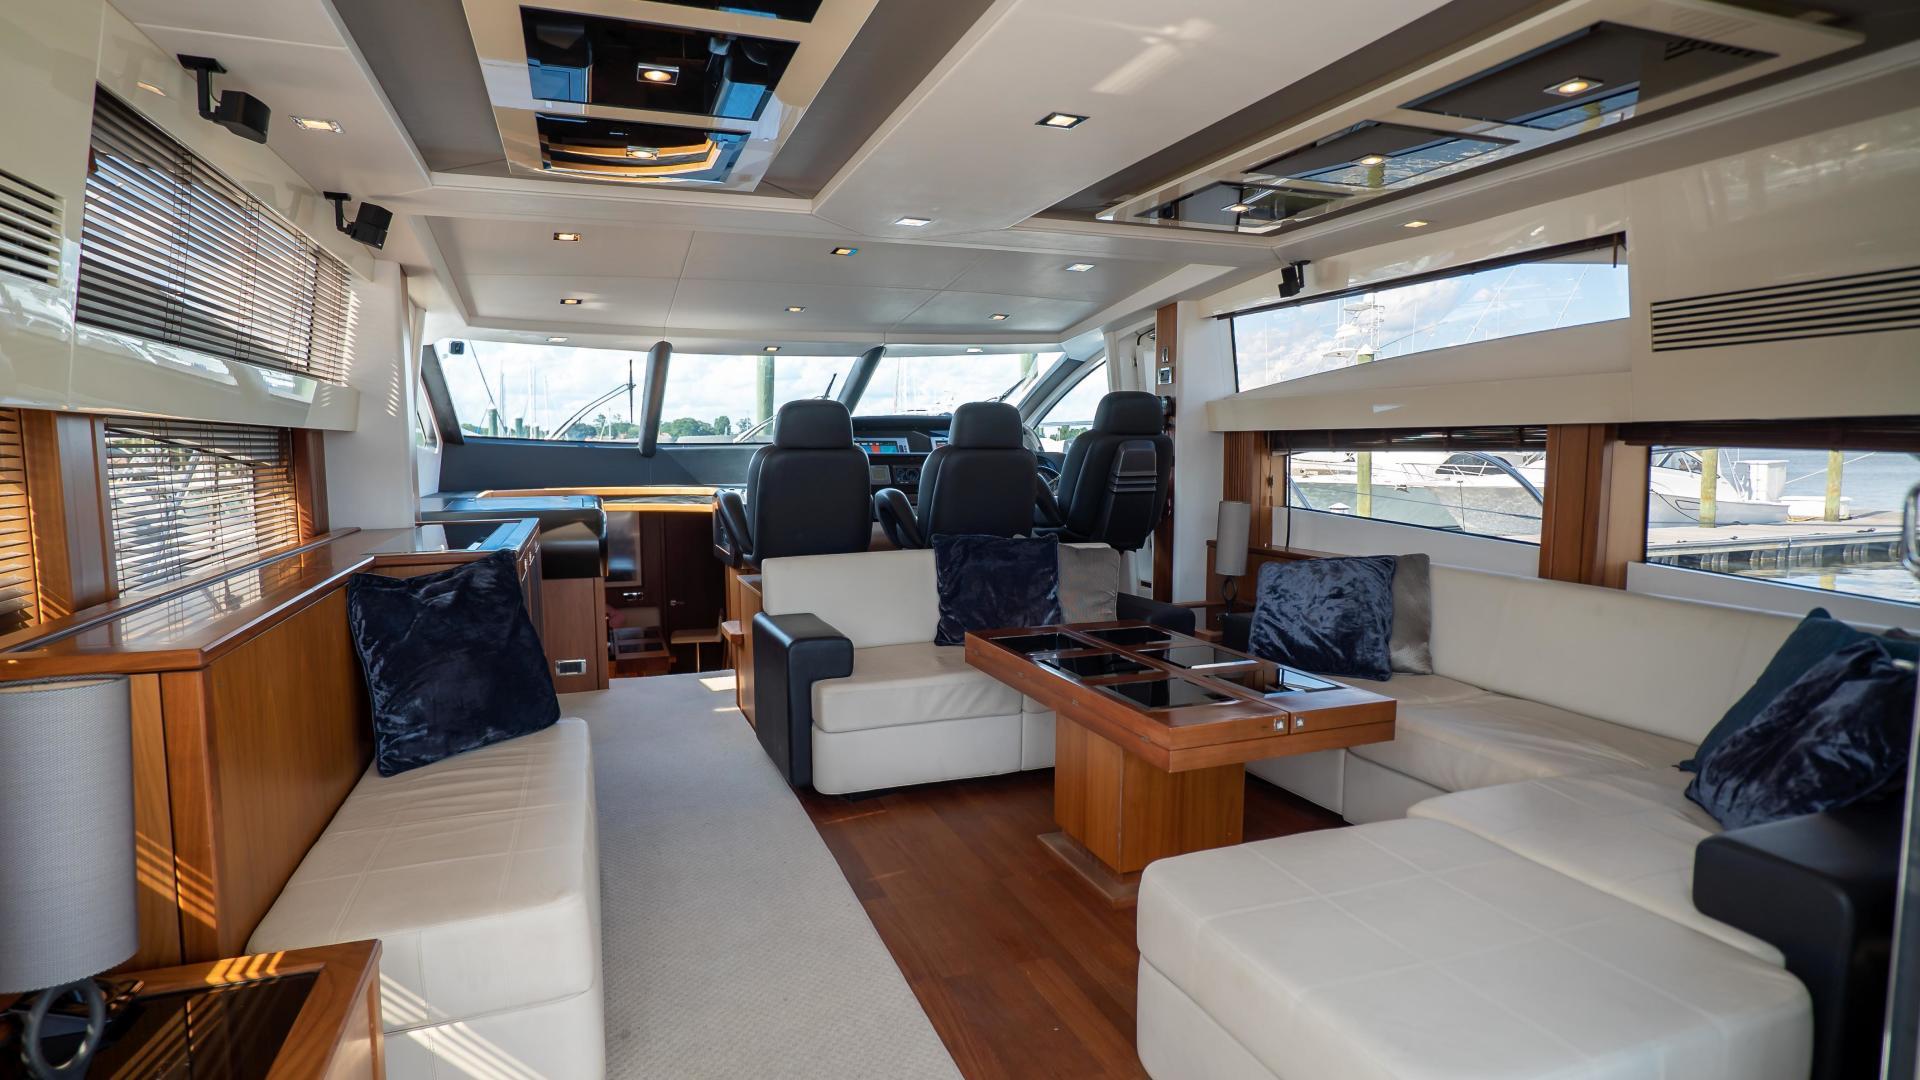 Sunseeker-Motor yacht 2012-JIMBO New Port-Rhode Island-United States-1480219   Thumbnail